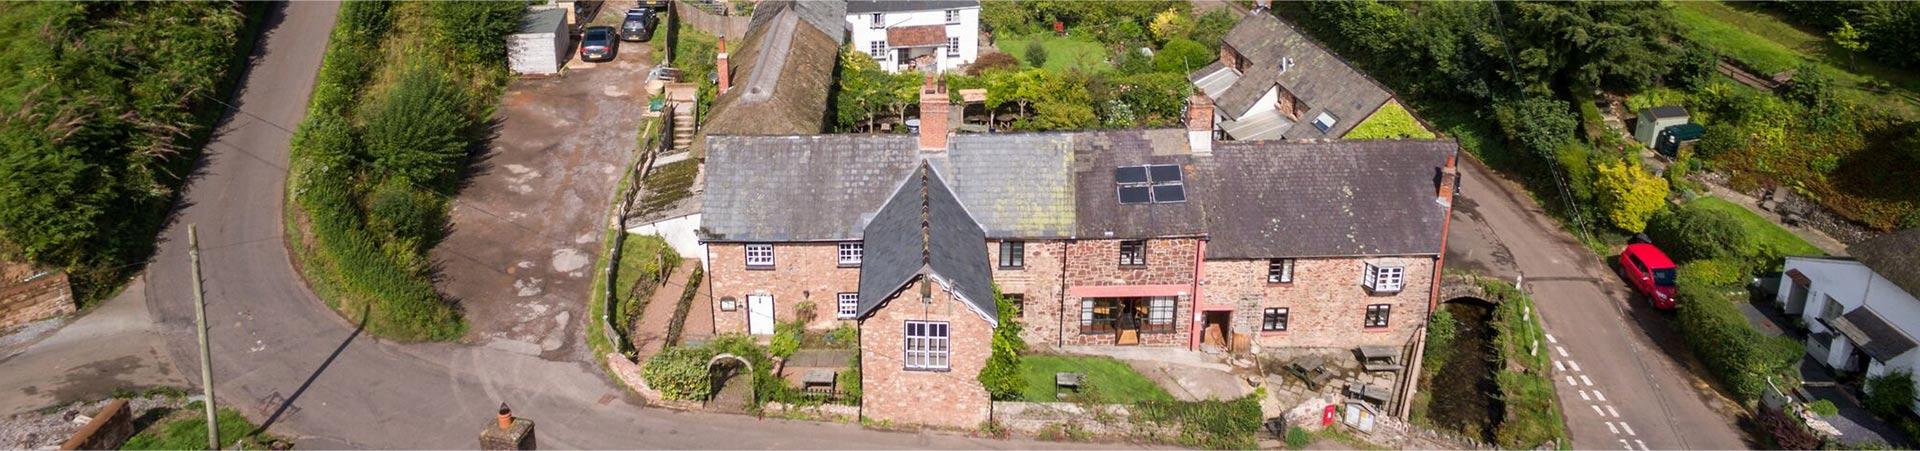 The Royal Oak inn aerial view over Luxborough